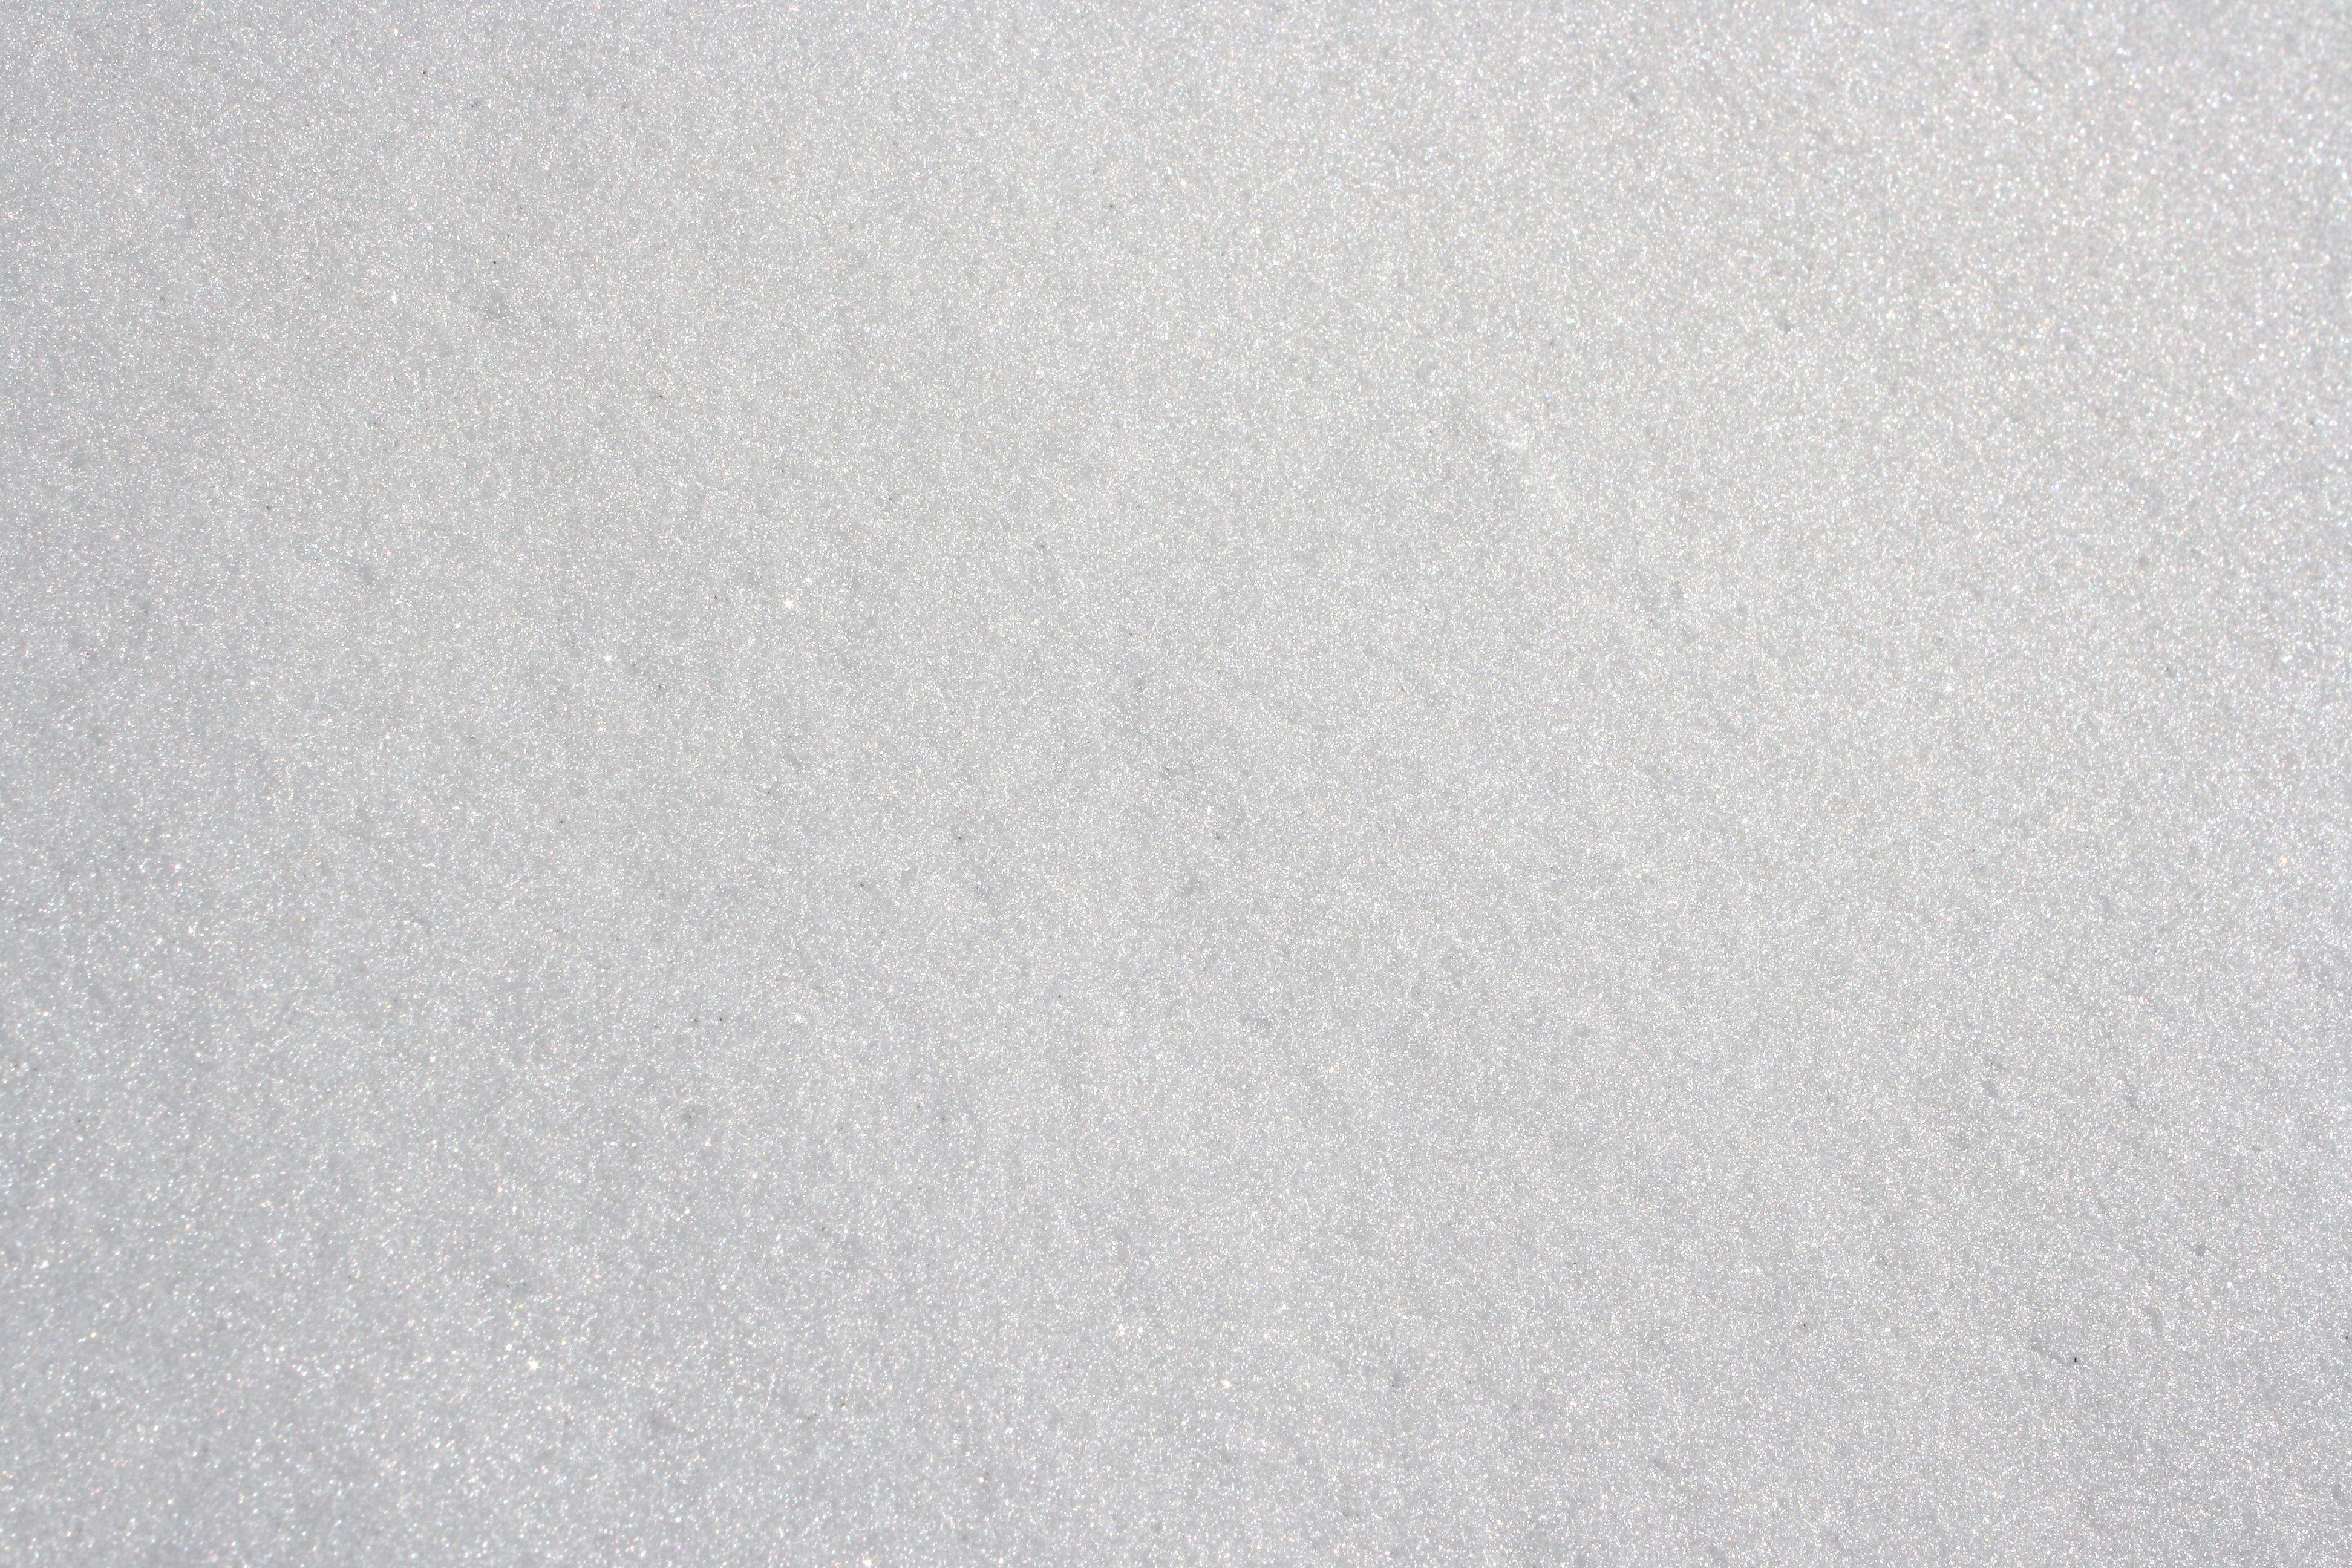 Snow Texture Gres Porcelanico Pavimento Textura De Papel Tapiz